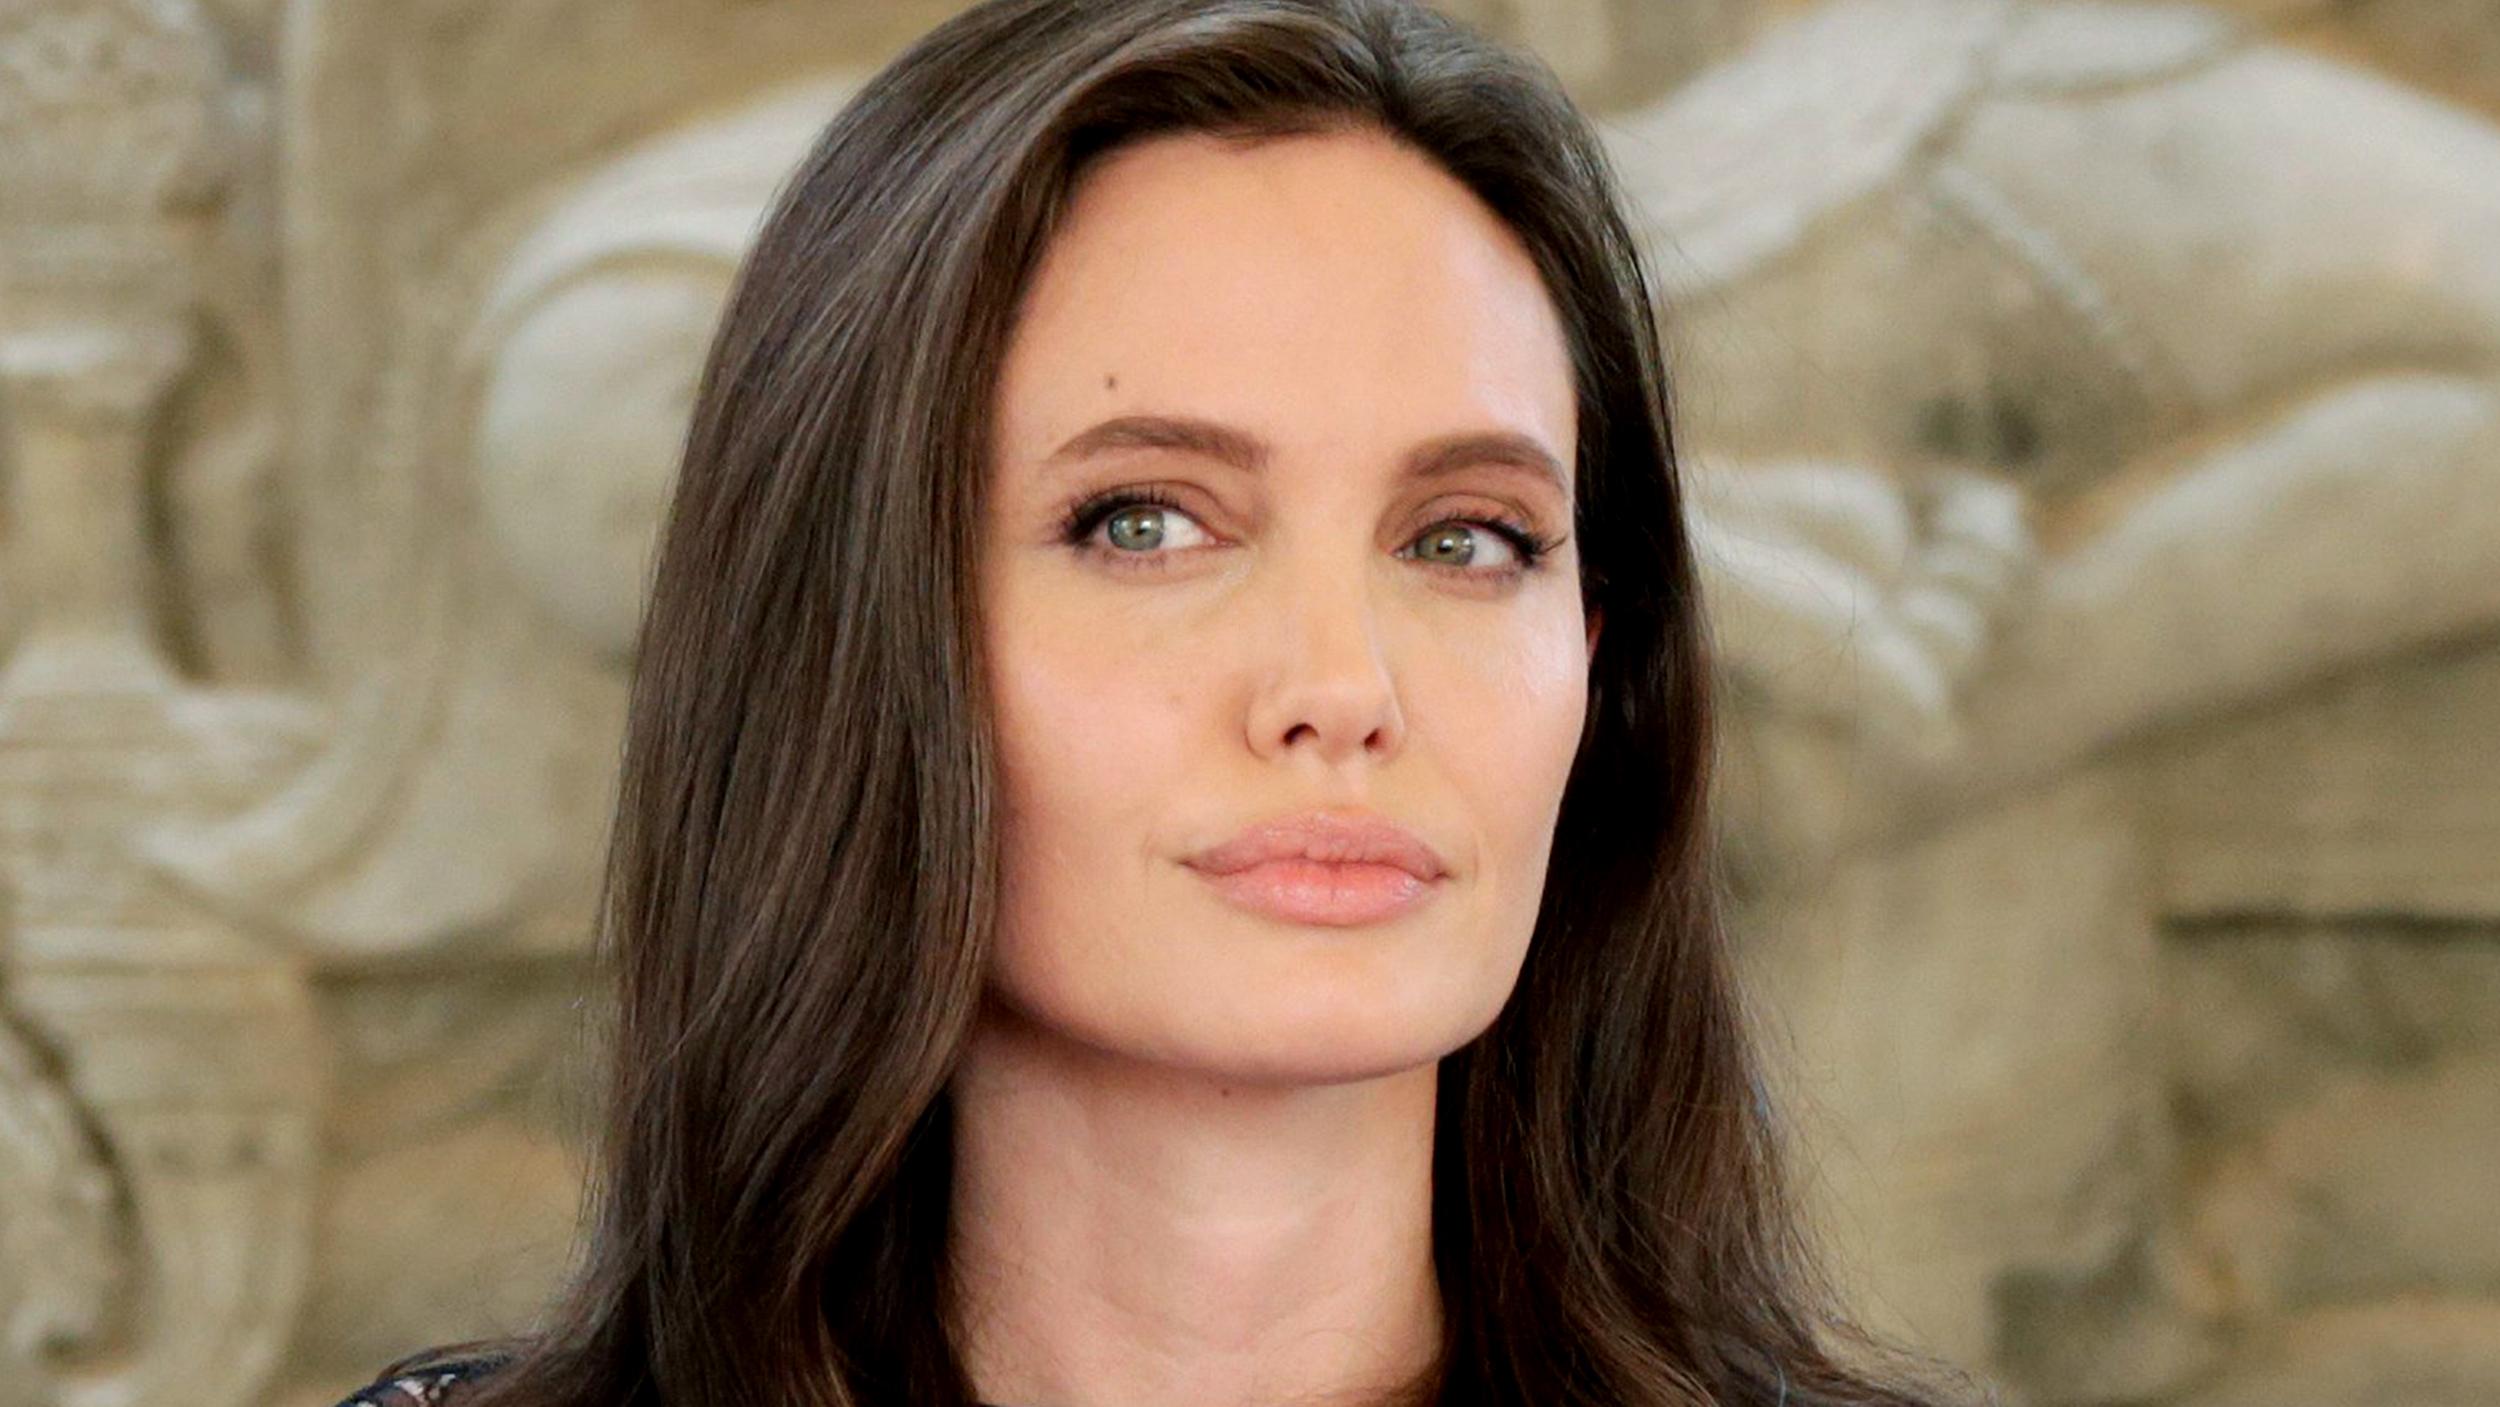 Angelina Jolie on split with Brad Pitt: 'We will always be ...